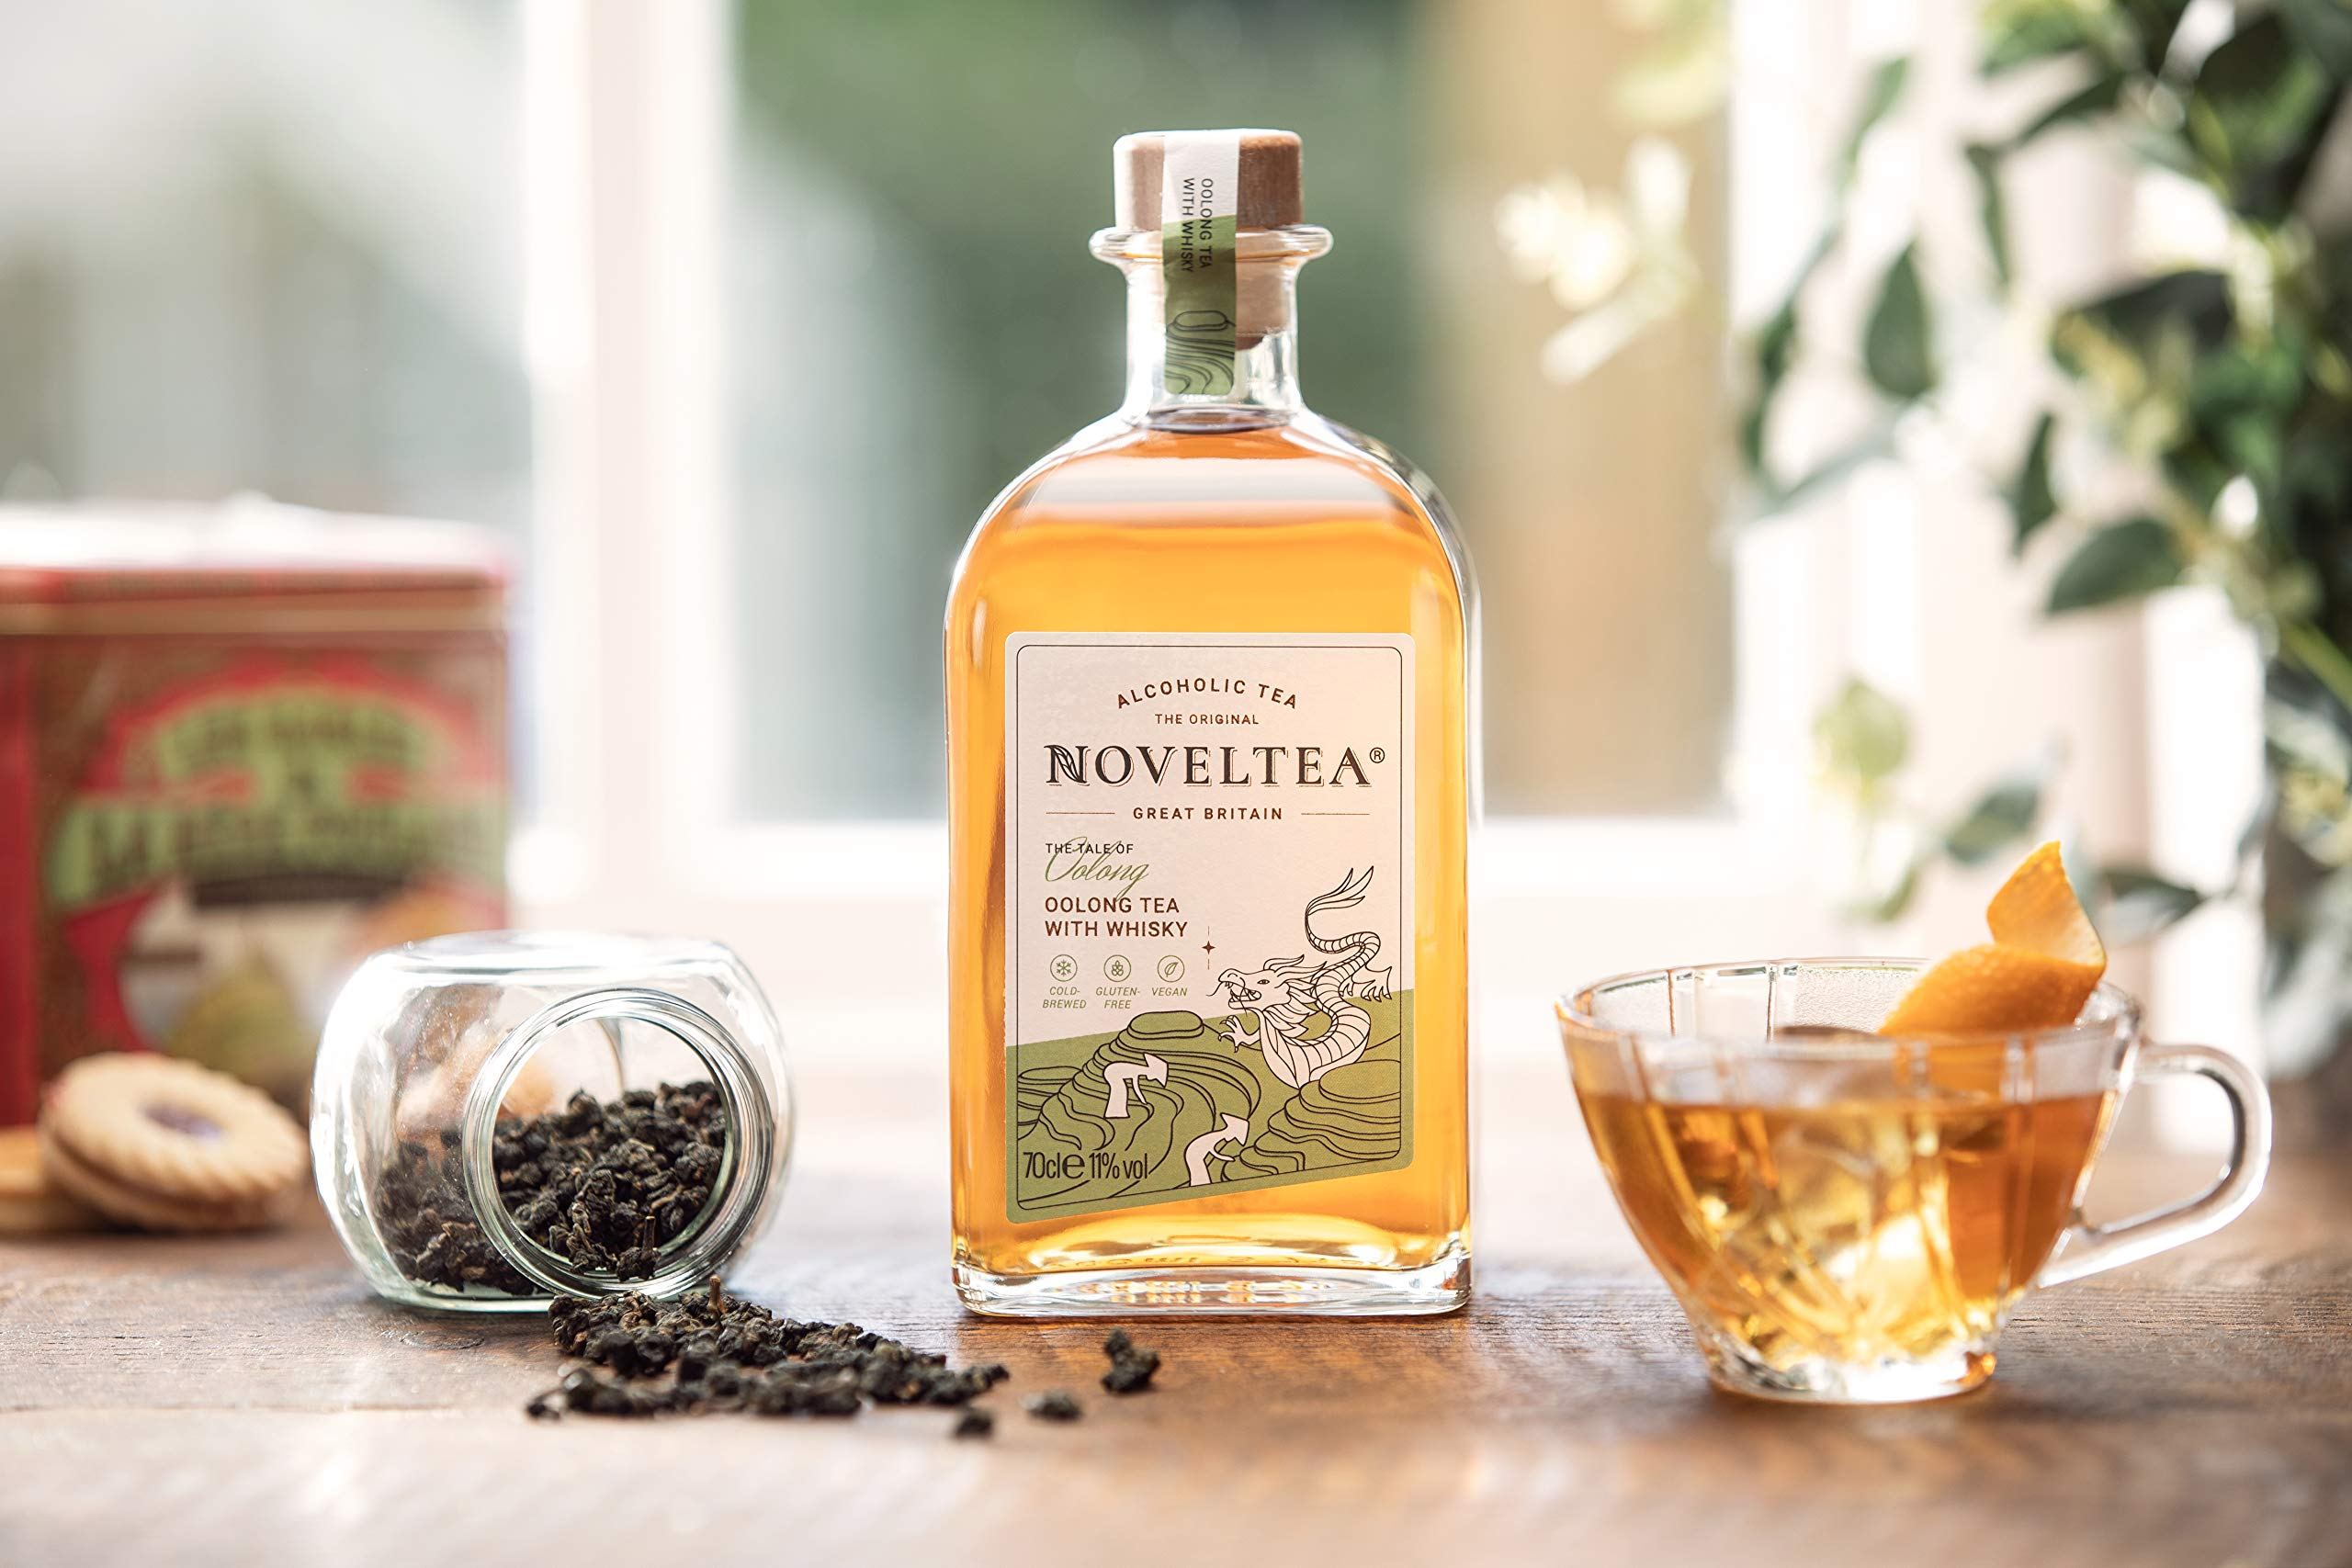 Noveltea-Alkoholischer-Tee-2er-Set-The-Tale-of-Oolong-Tangier-2-x-700ml-Die-Hhle-der-Lwen-WhiskyRum-11-Vol